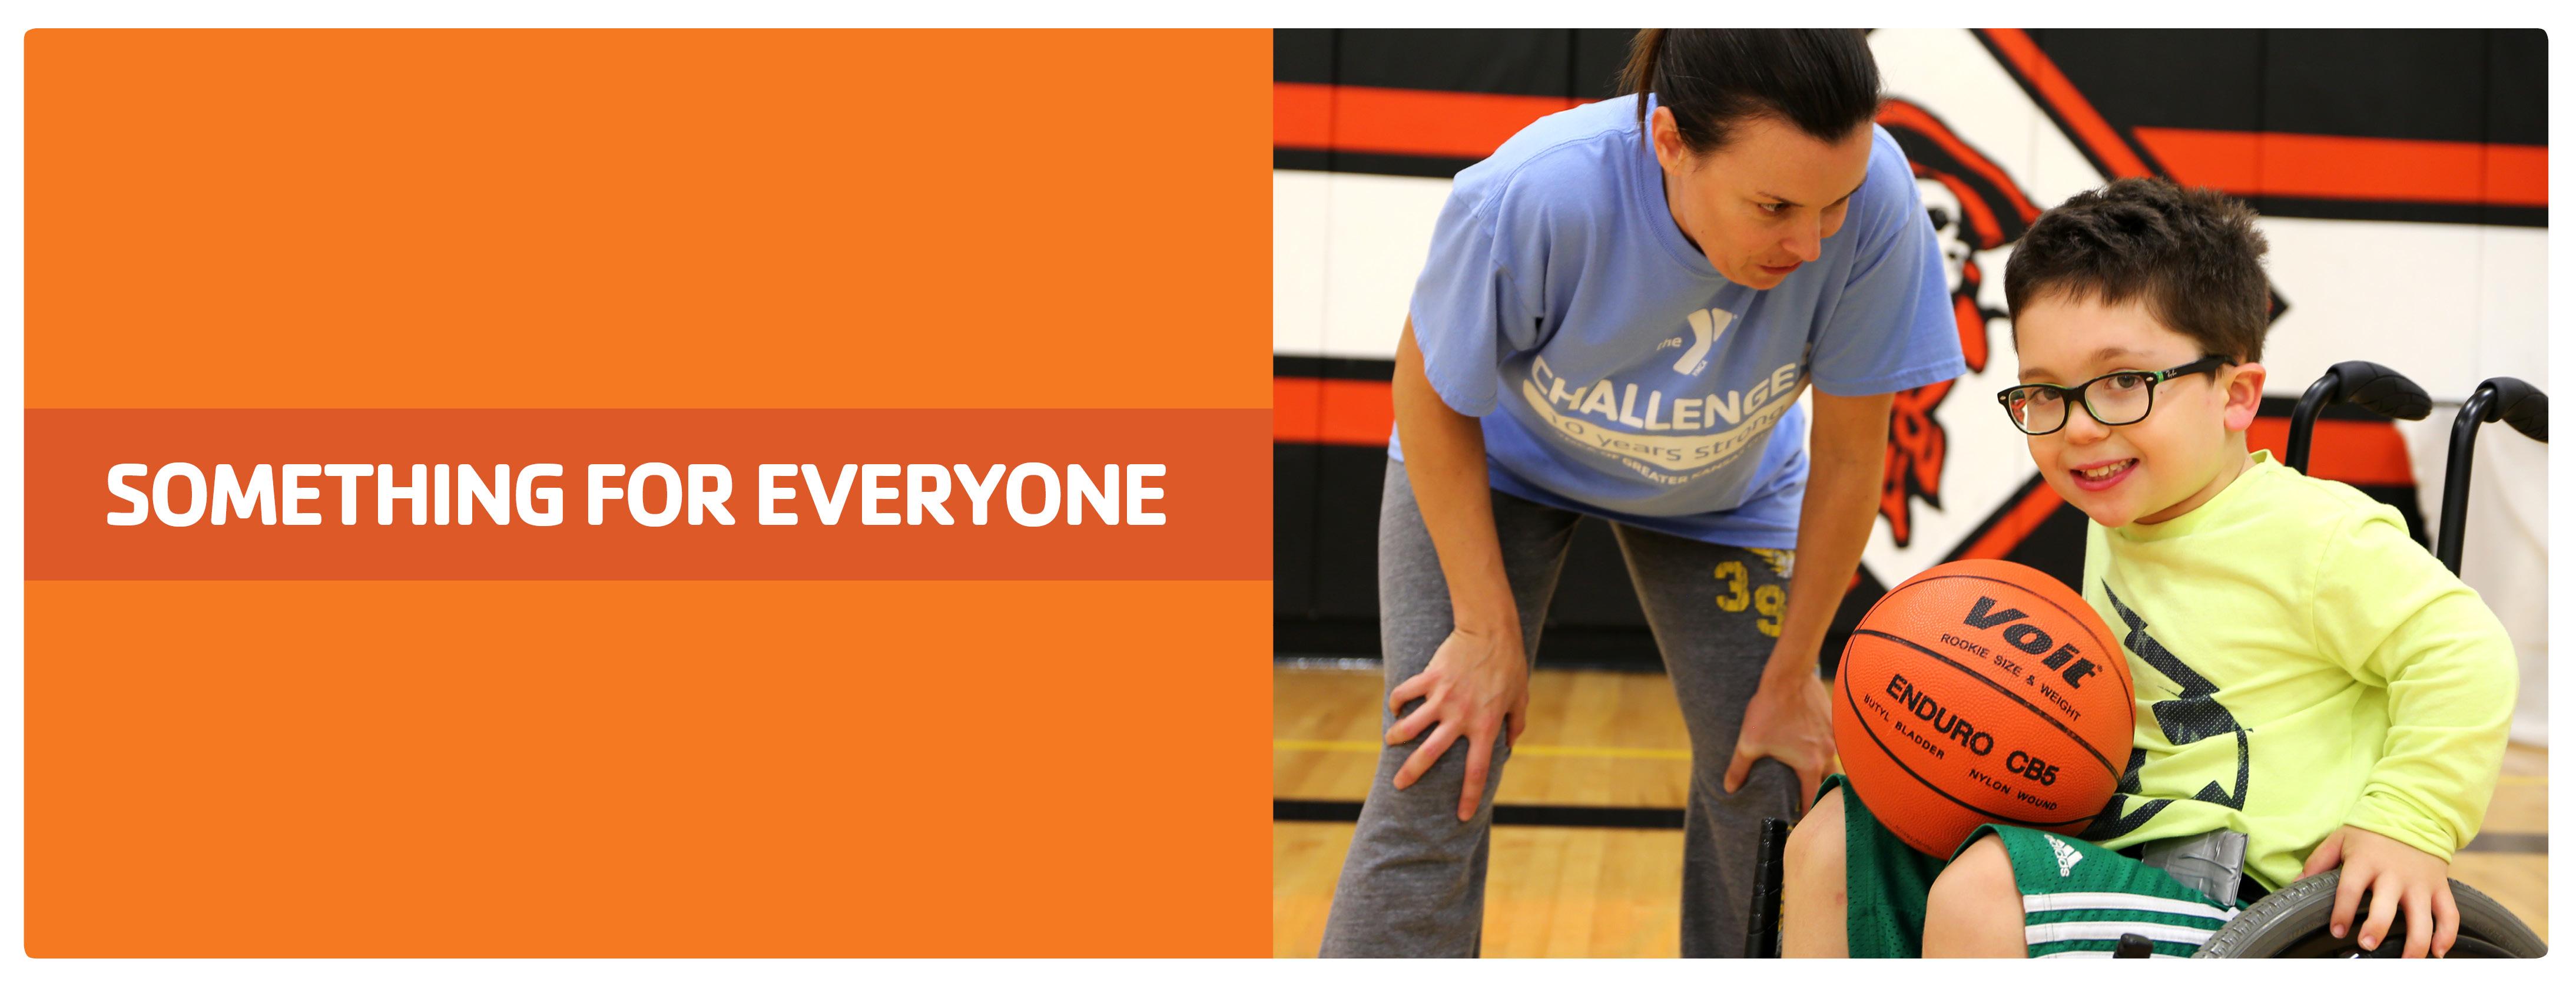 YMCA of Greater Kansas City - Challenger Program 3